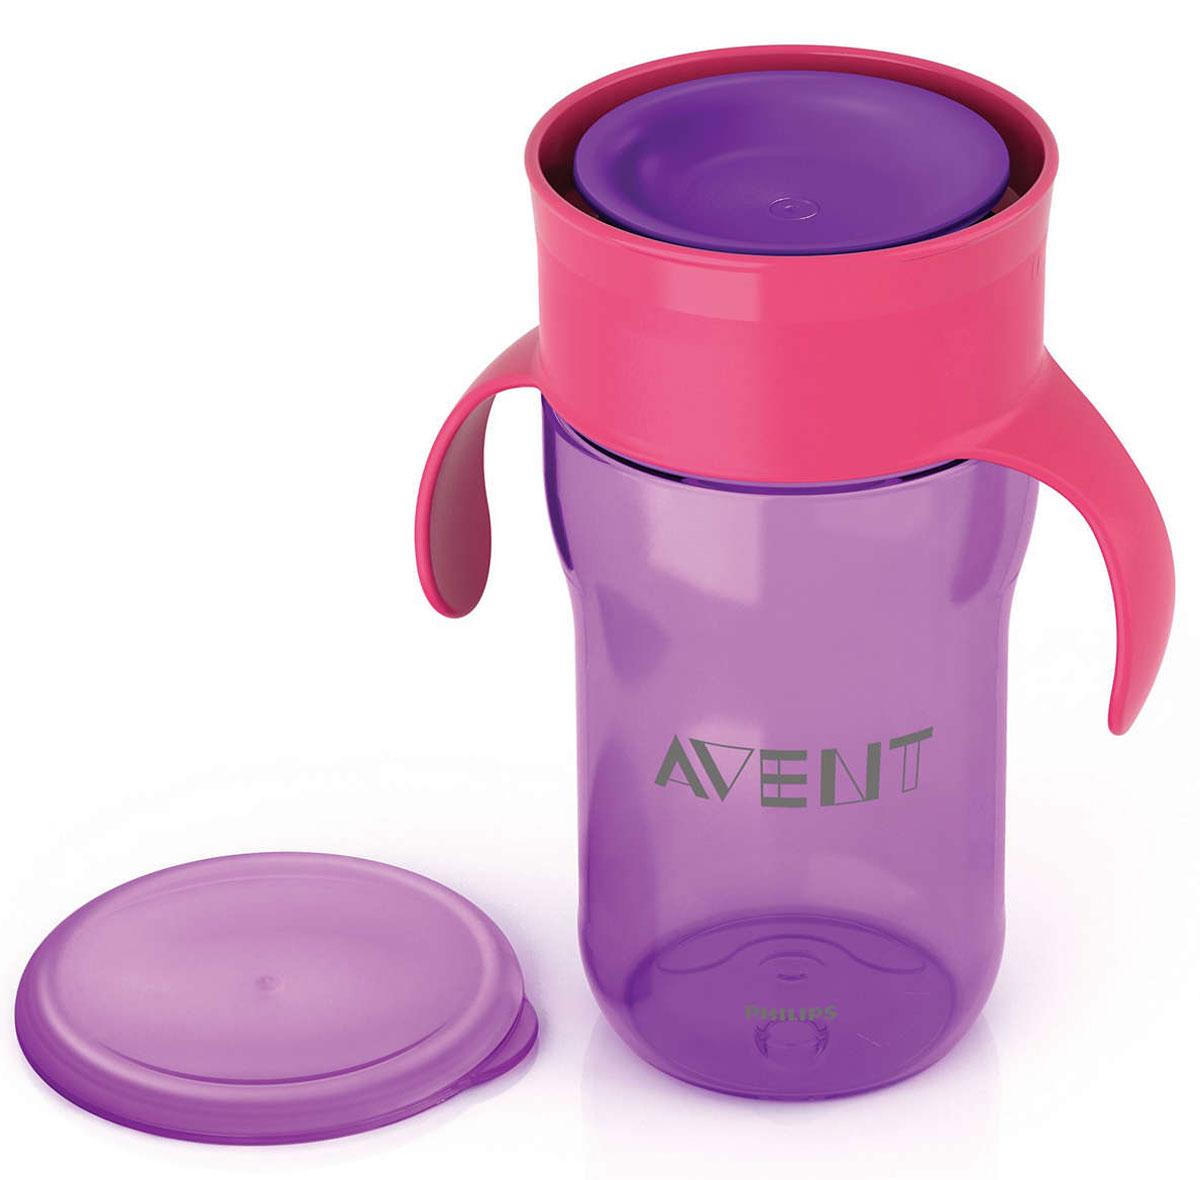 Philips Avent Взрослая чашка, 340 мл, 18м+, 1 шт фиолетовый SCF784/00 чашка с трубочкой philips avent scf762 00 с 18 мес 340 мл в ассортименте